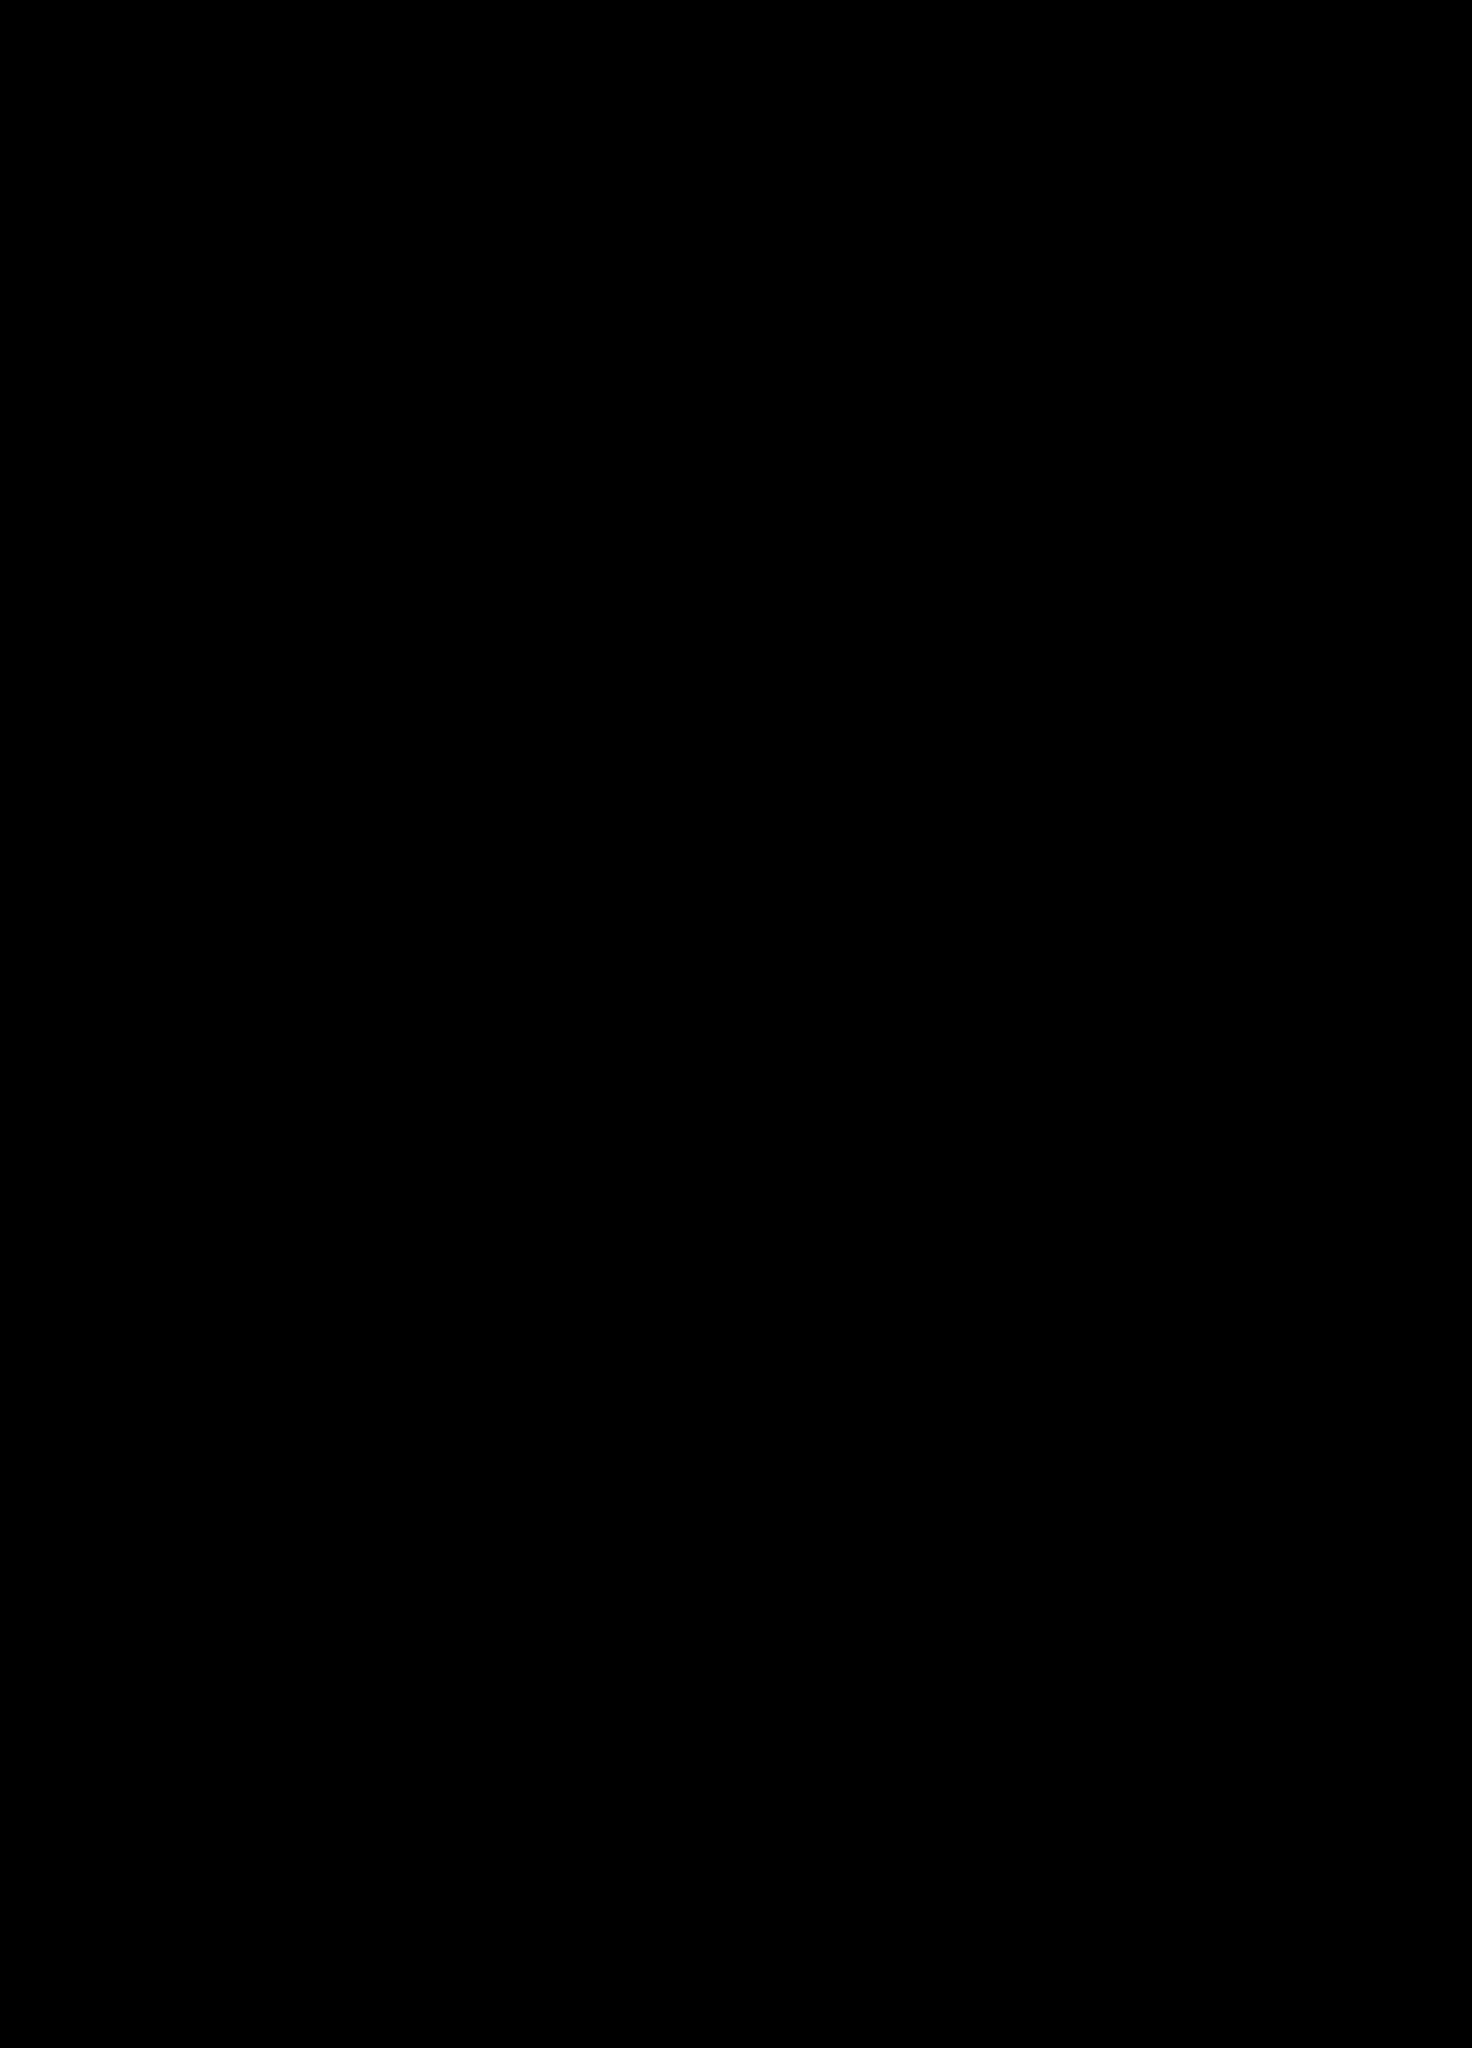 Castle silhouette clip art. Cinderella clipart shadow